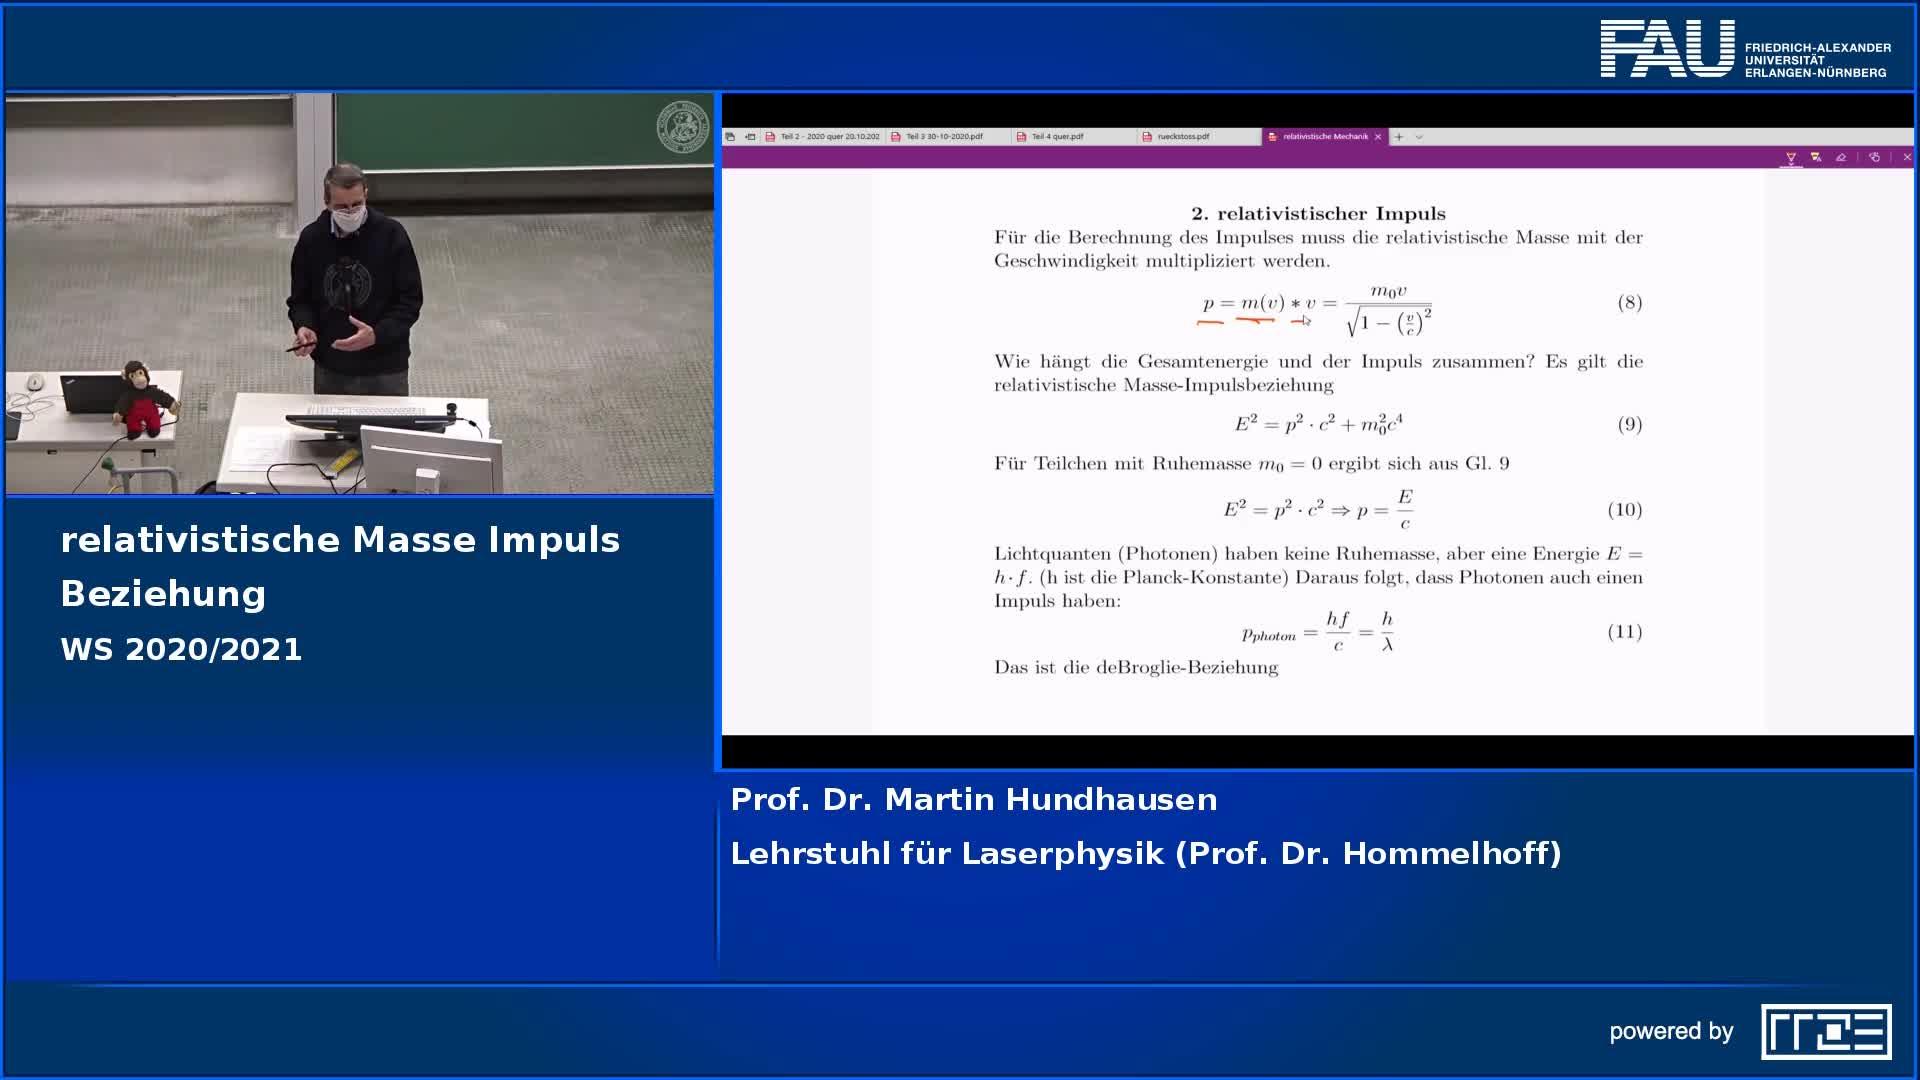 Relativistische Masse-Impuls Beziehung preview image